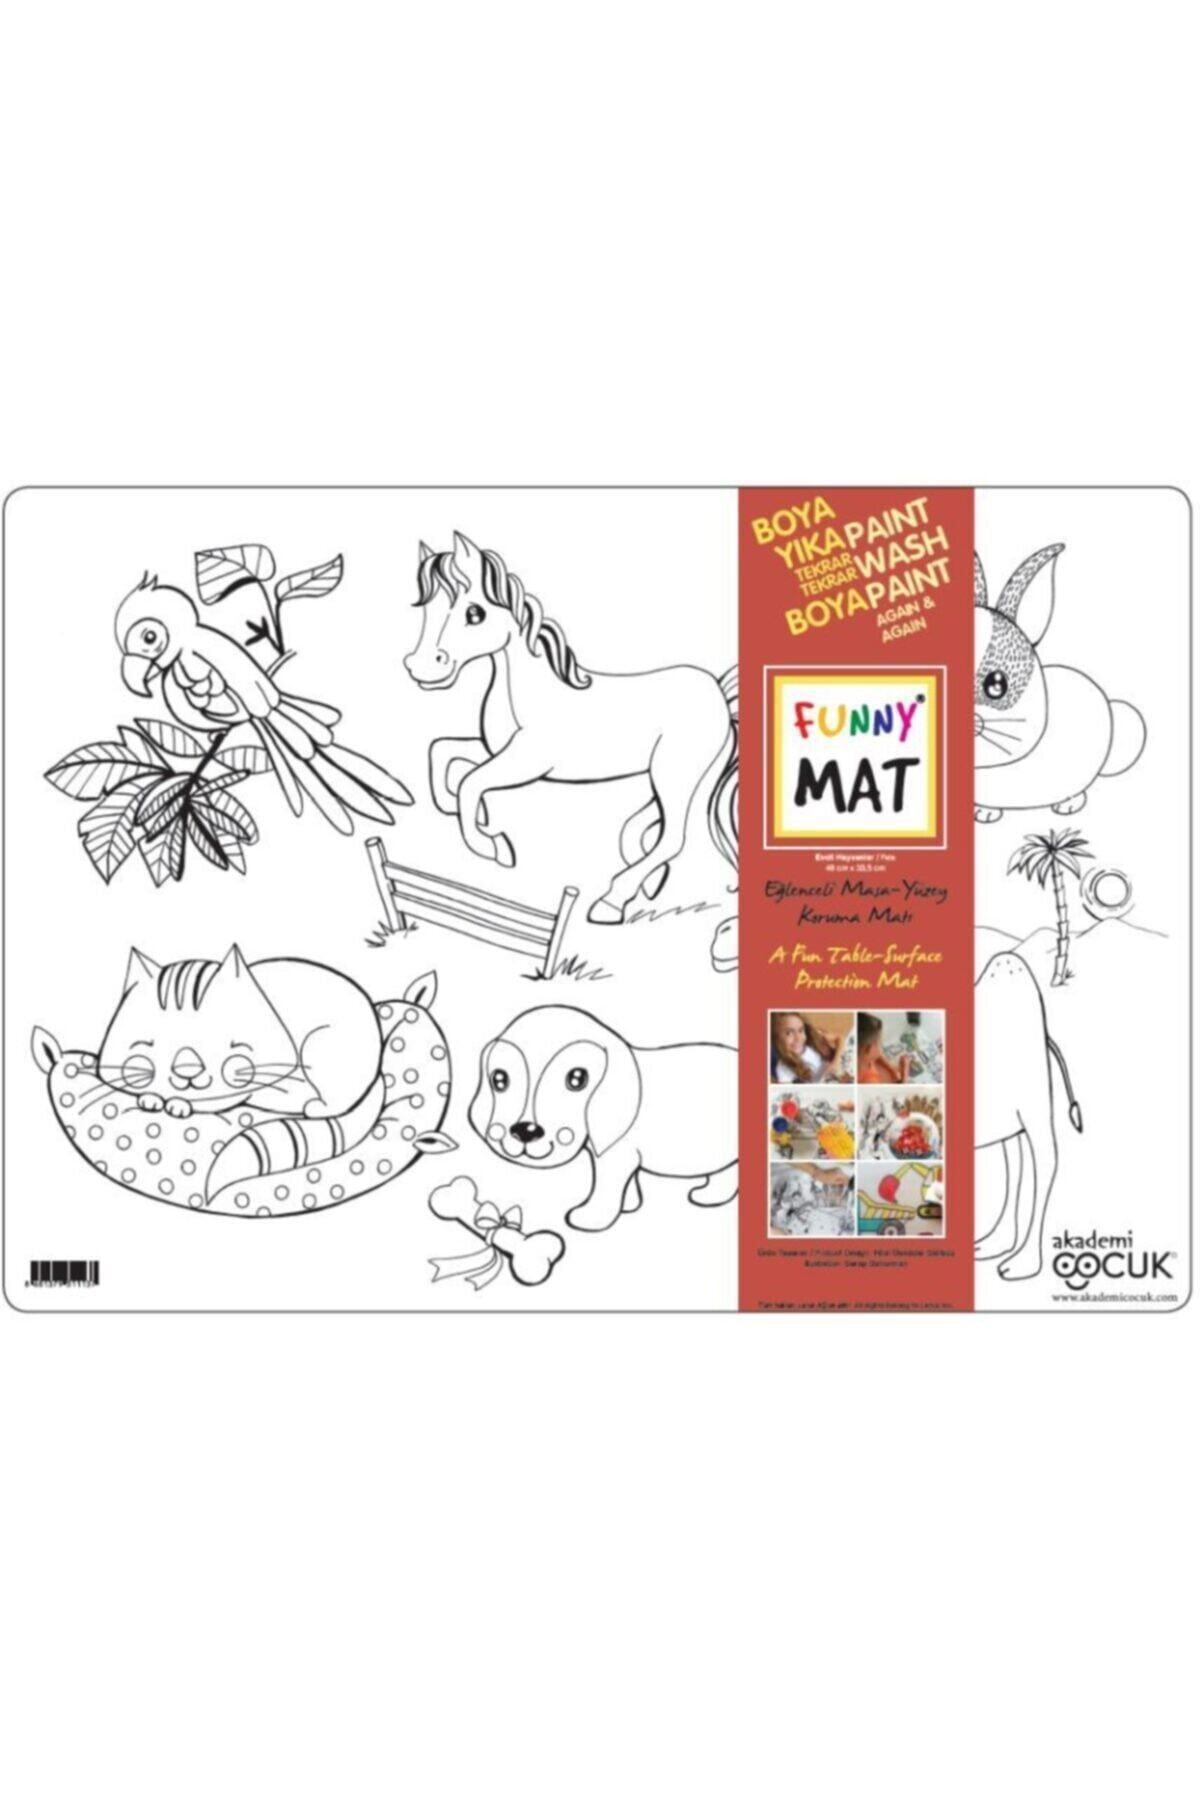 Akademi Çocuk - Funny Mat Funny Mat Evcil Hayvanlar 1